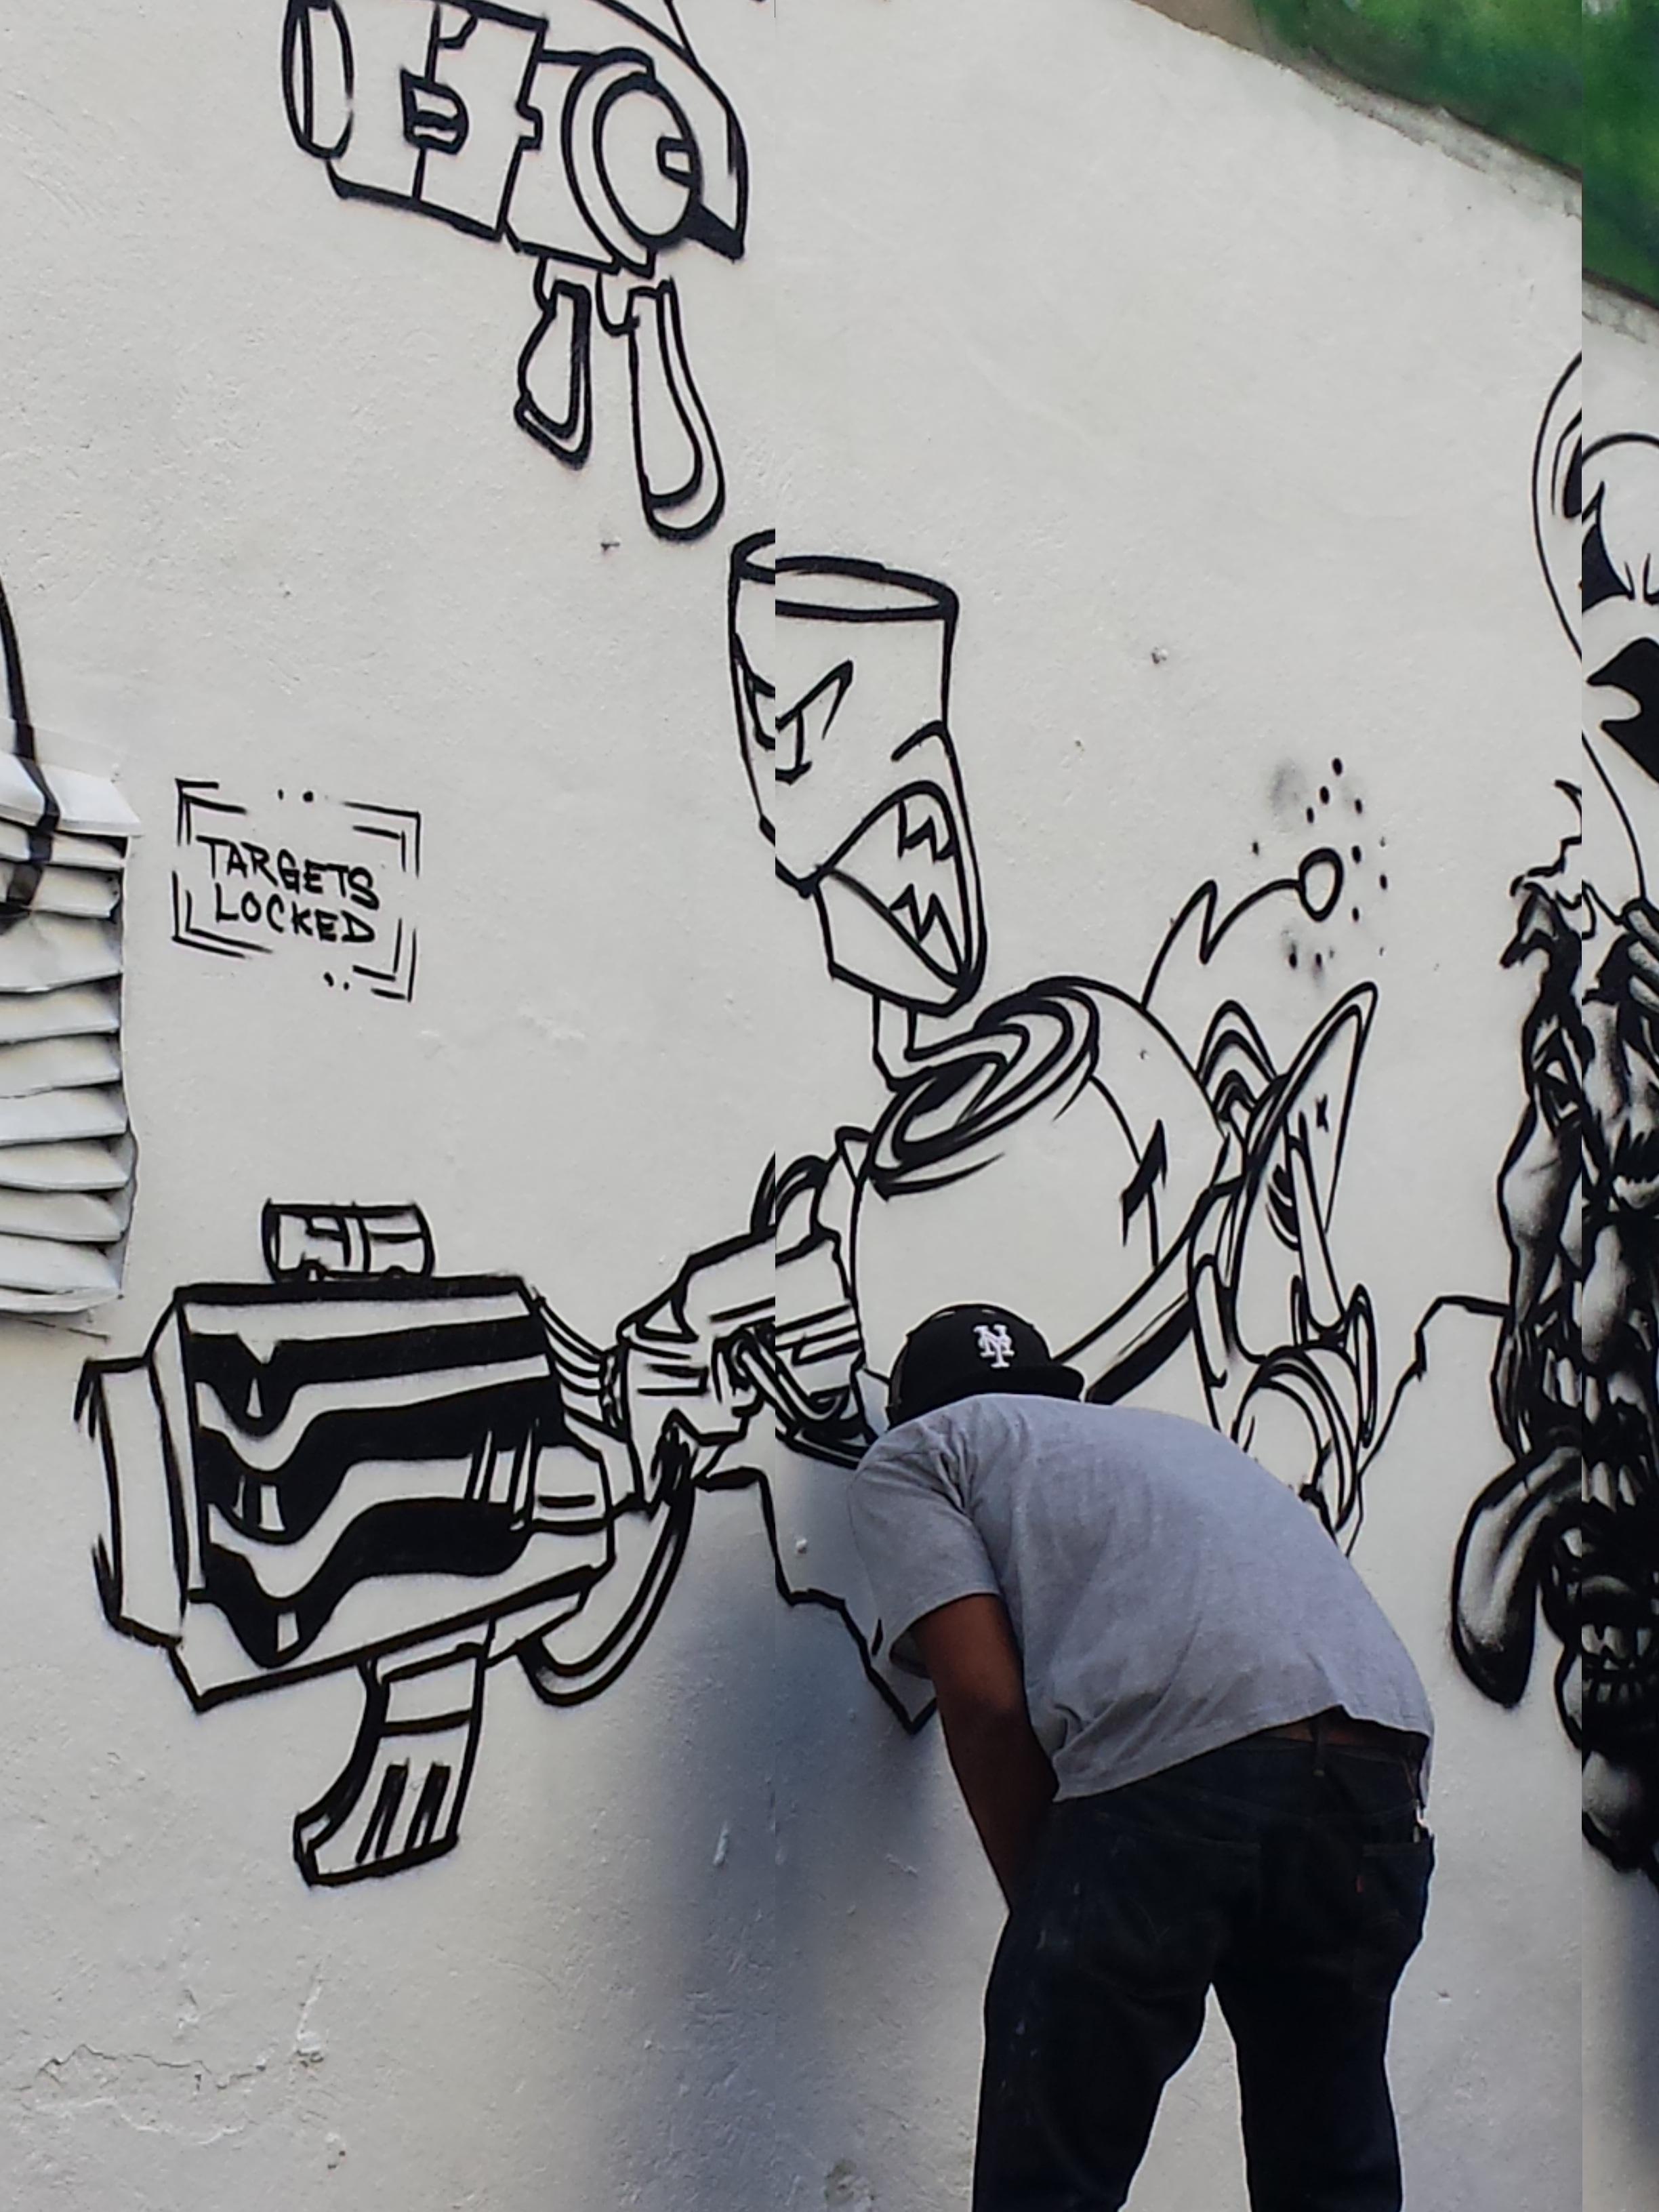 Free Urban Wall Spray Artistic Paint Graffiti